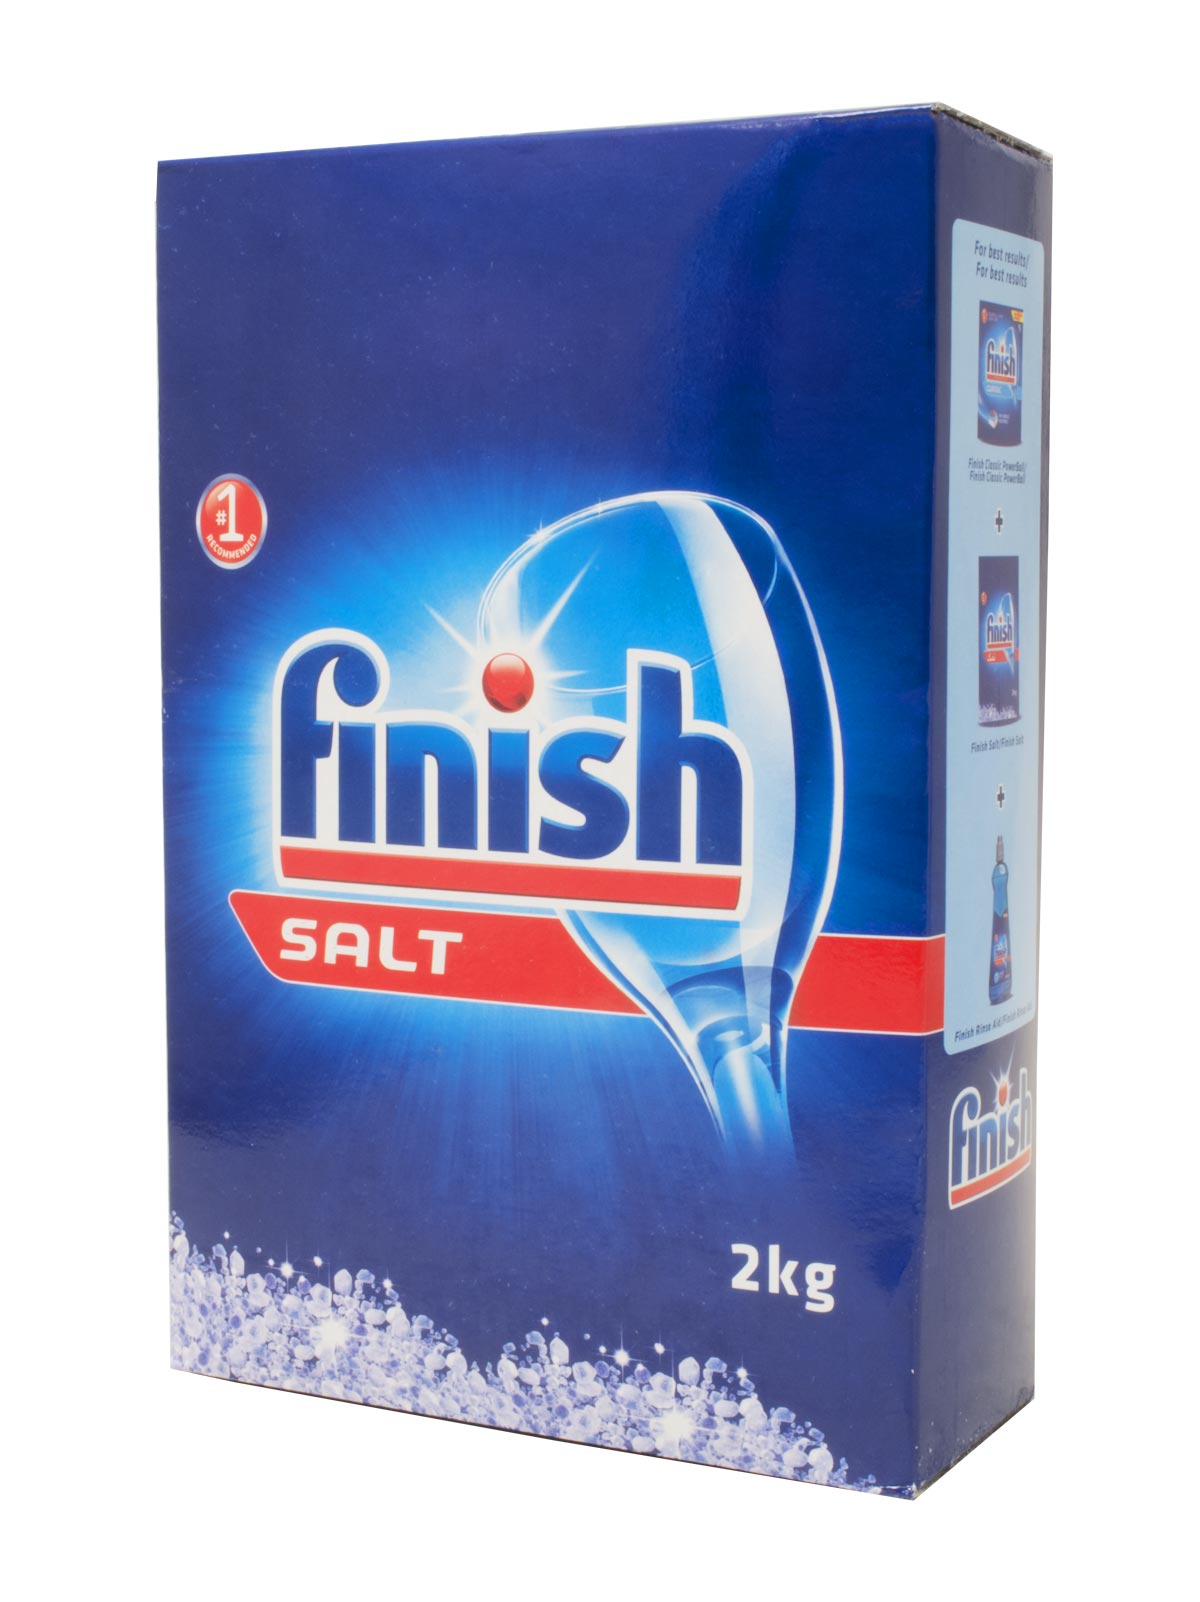 نمک ماشین ظرفشویی فینیش 2 کیلوگرم